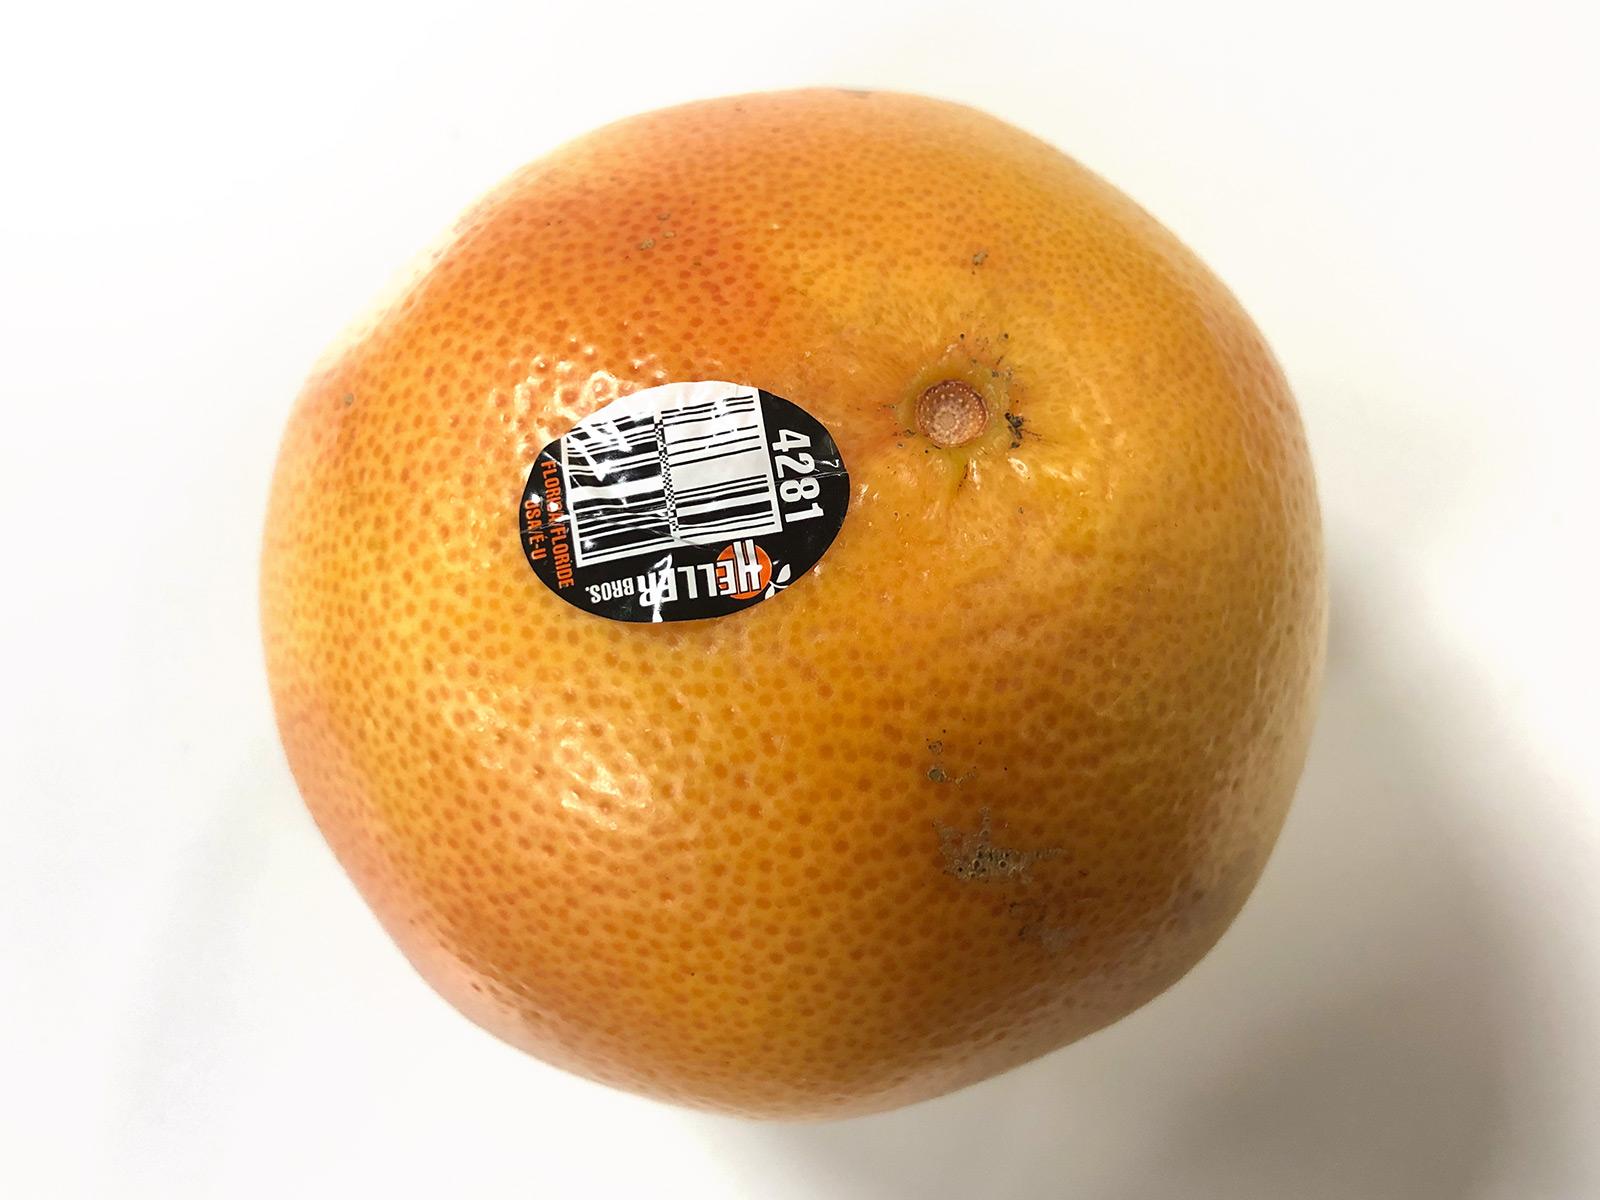 4281-heller-bros-large-grapefruit.jpg